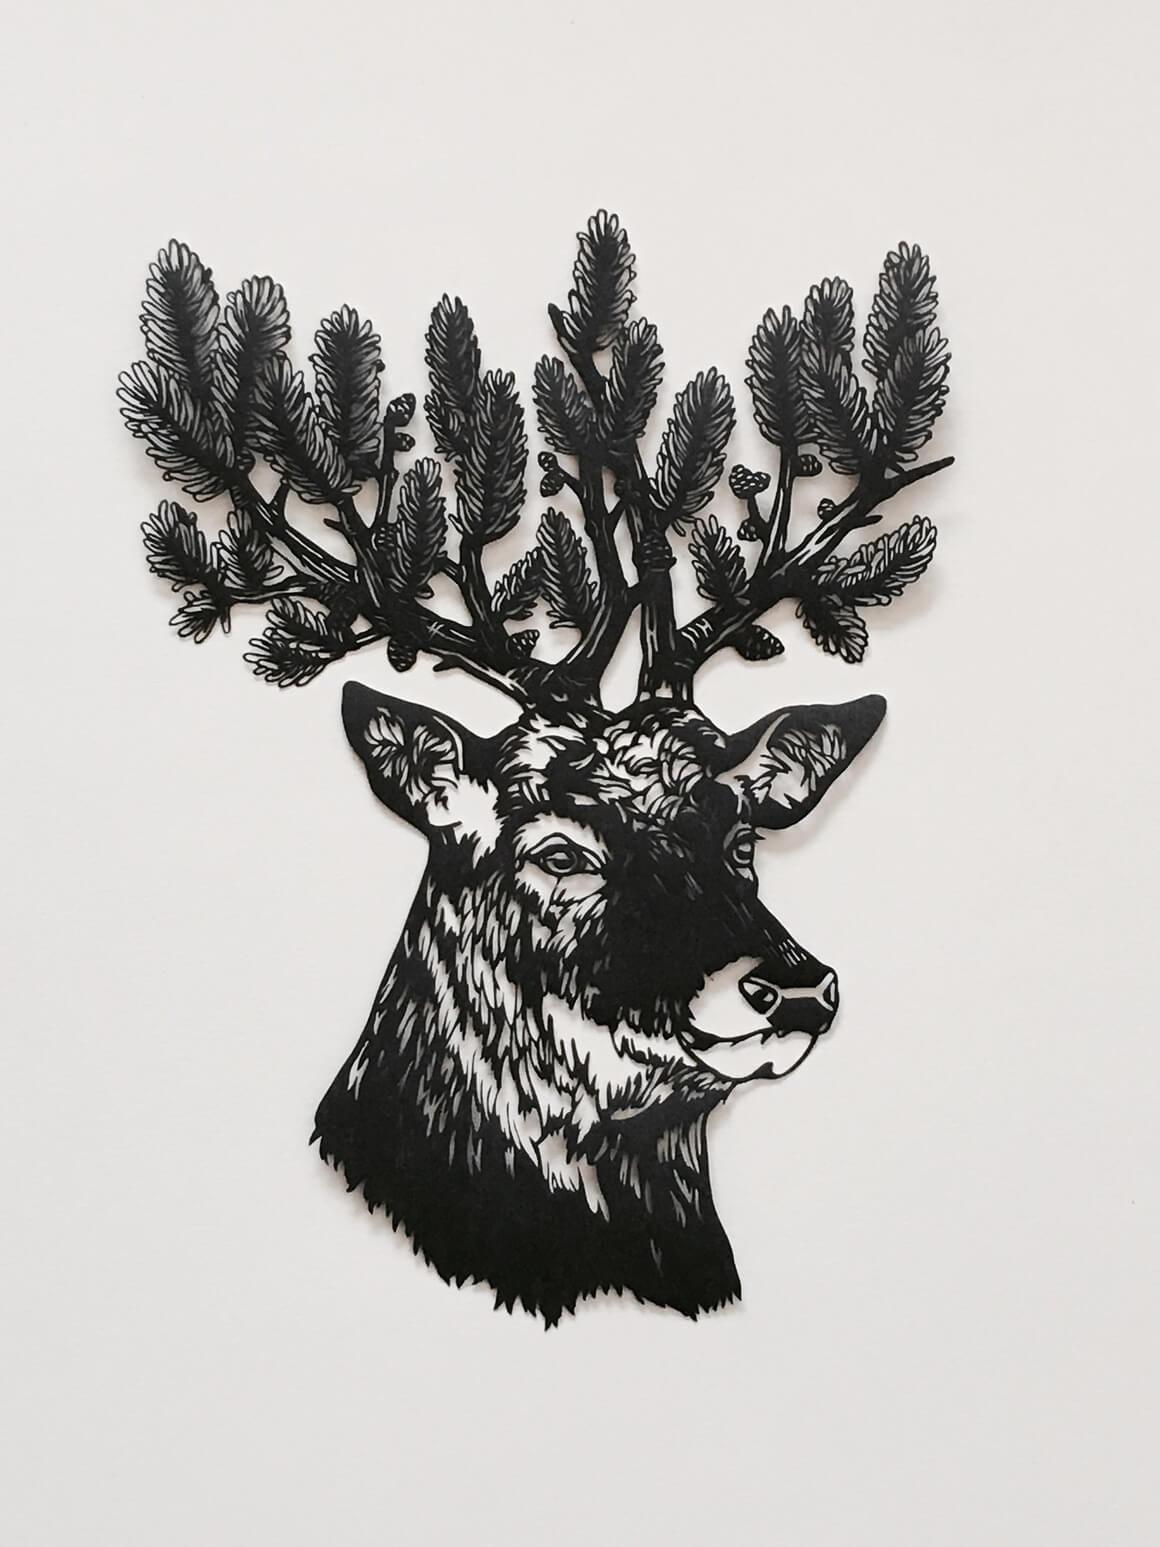 silueta de ciervo hecha con papel cortado a modo de ilustración por Kanako Abe